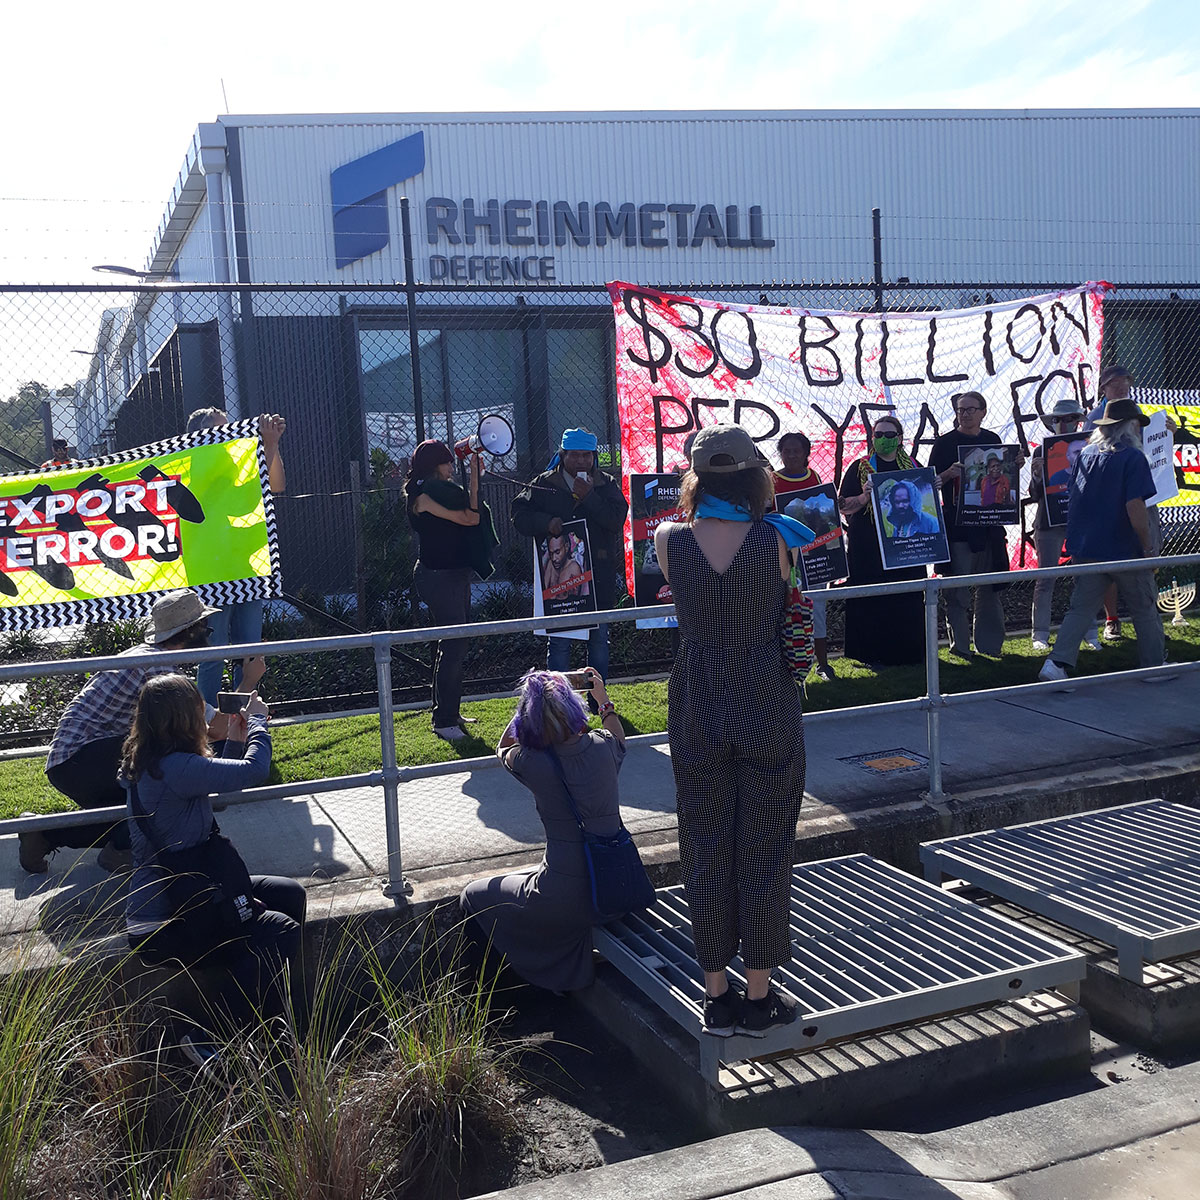 Rheinmetall protest